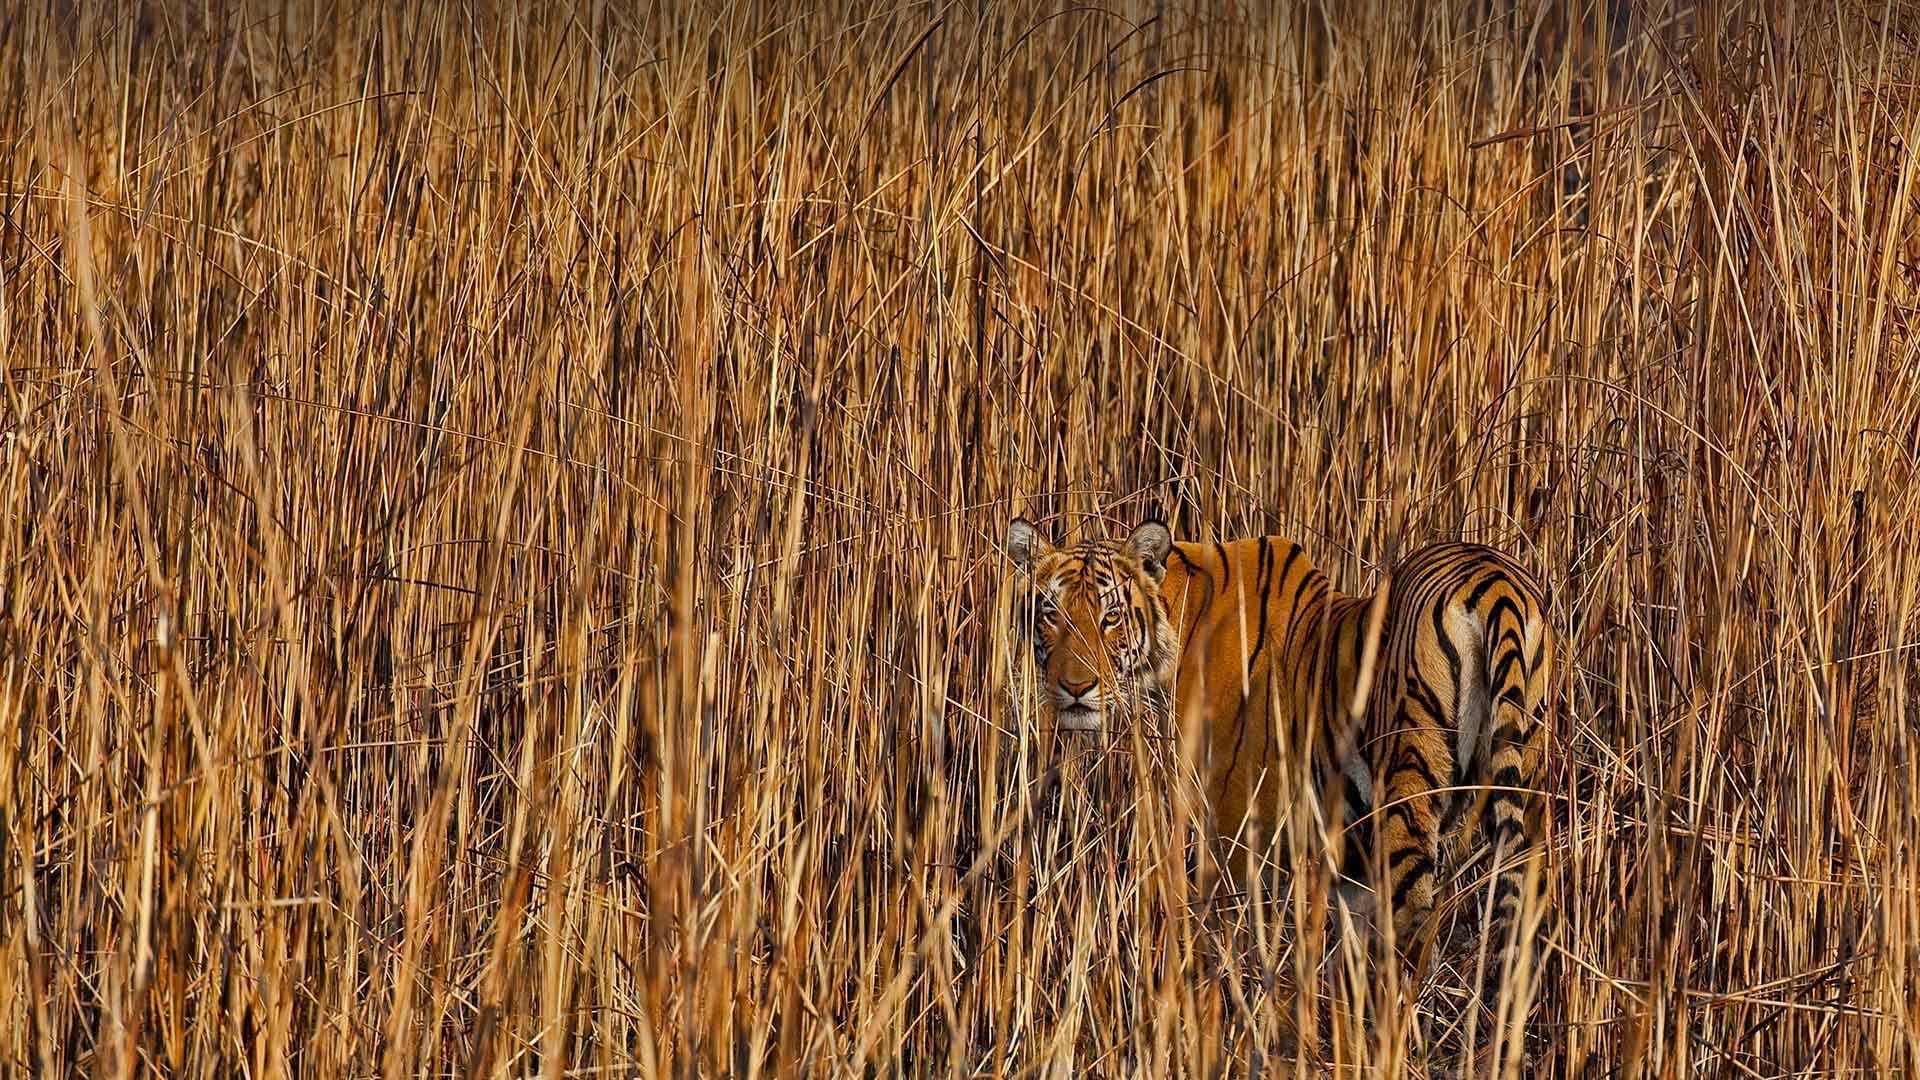 Tiger in Assam, India (© Sandesh Kadur/Minden Pictures)